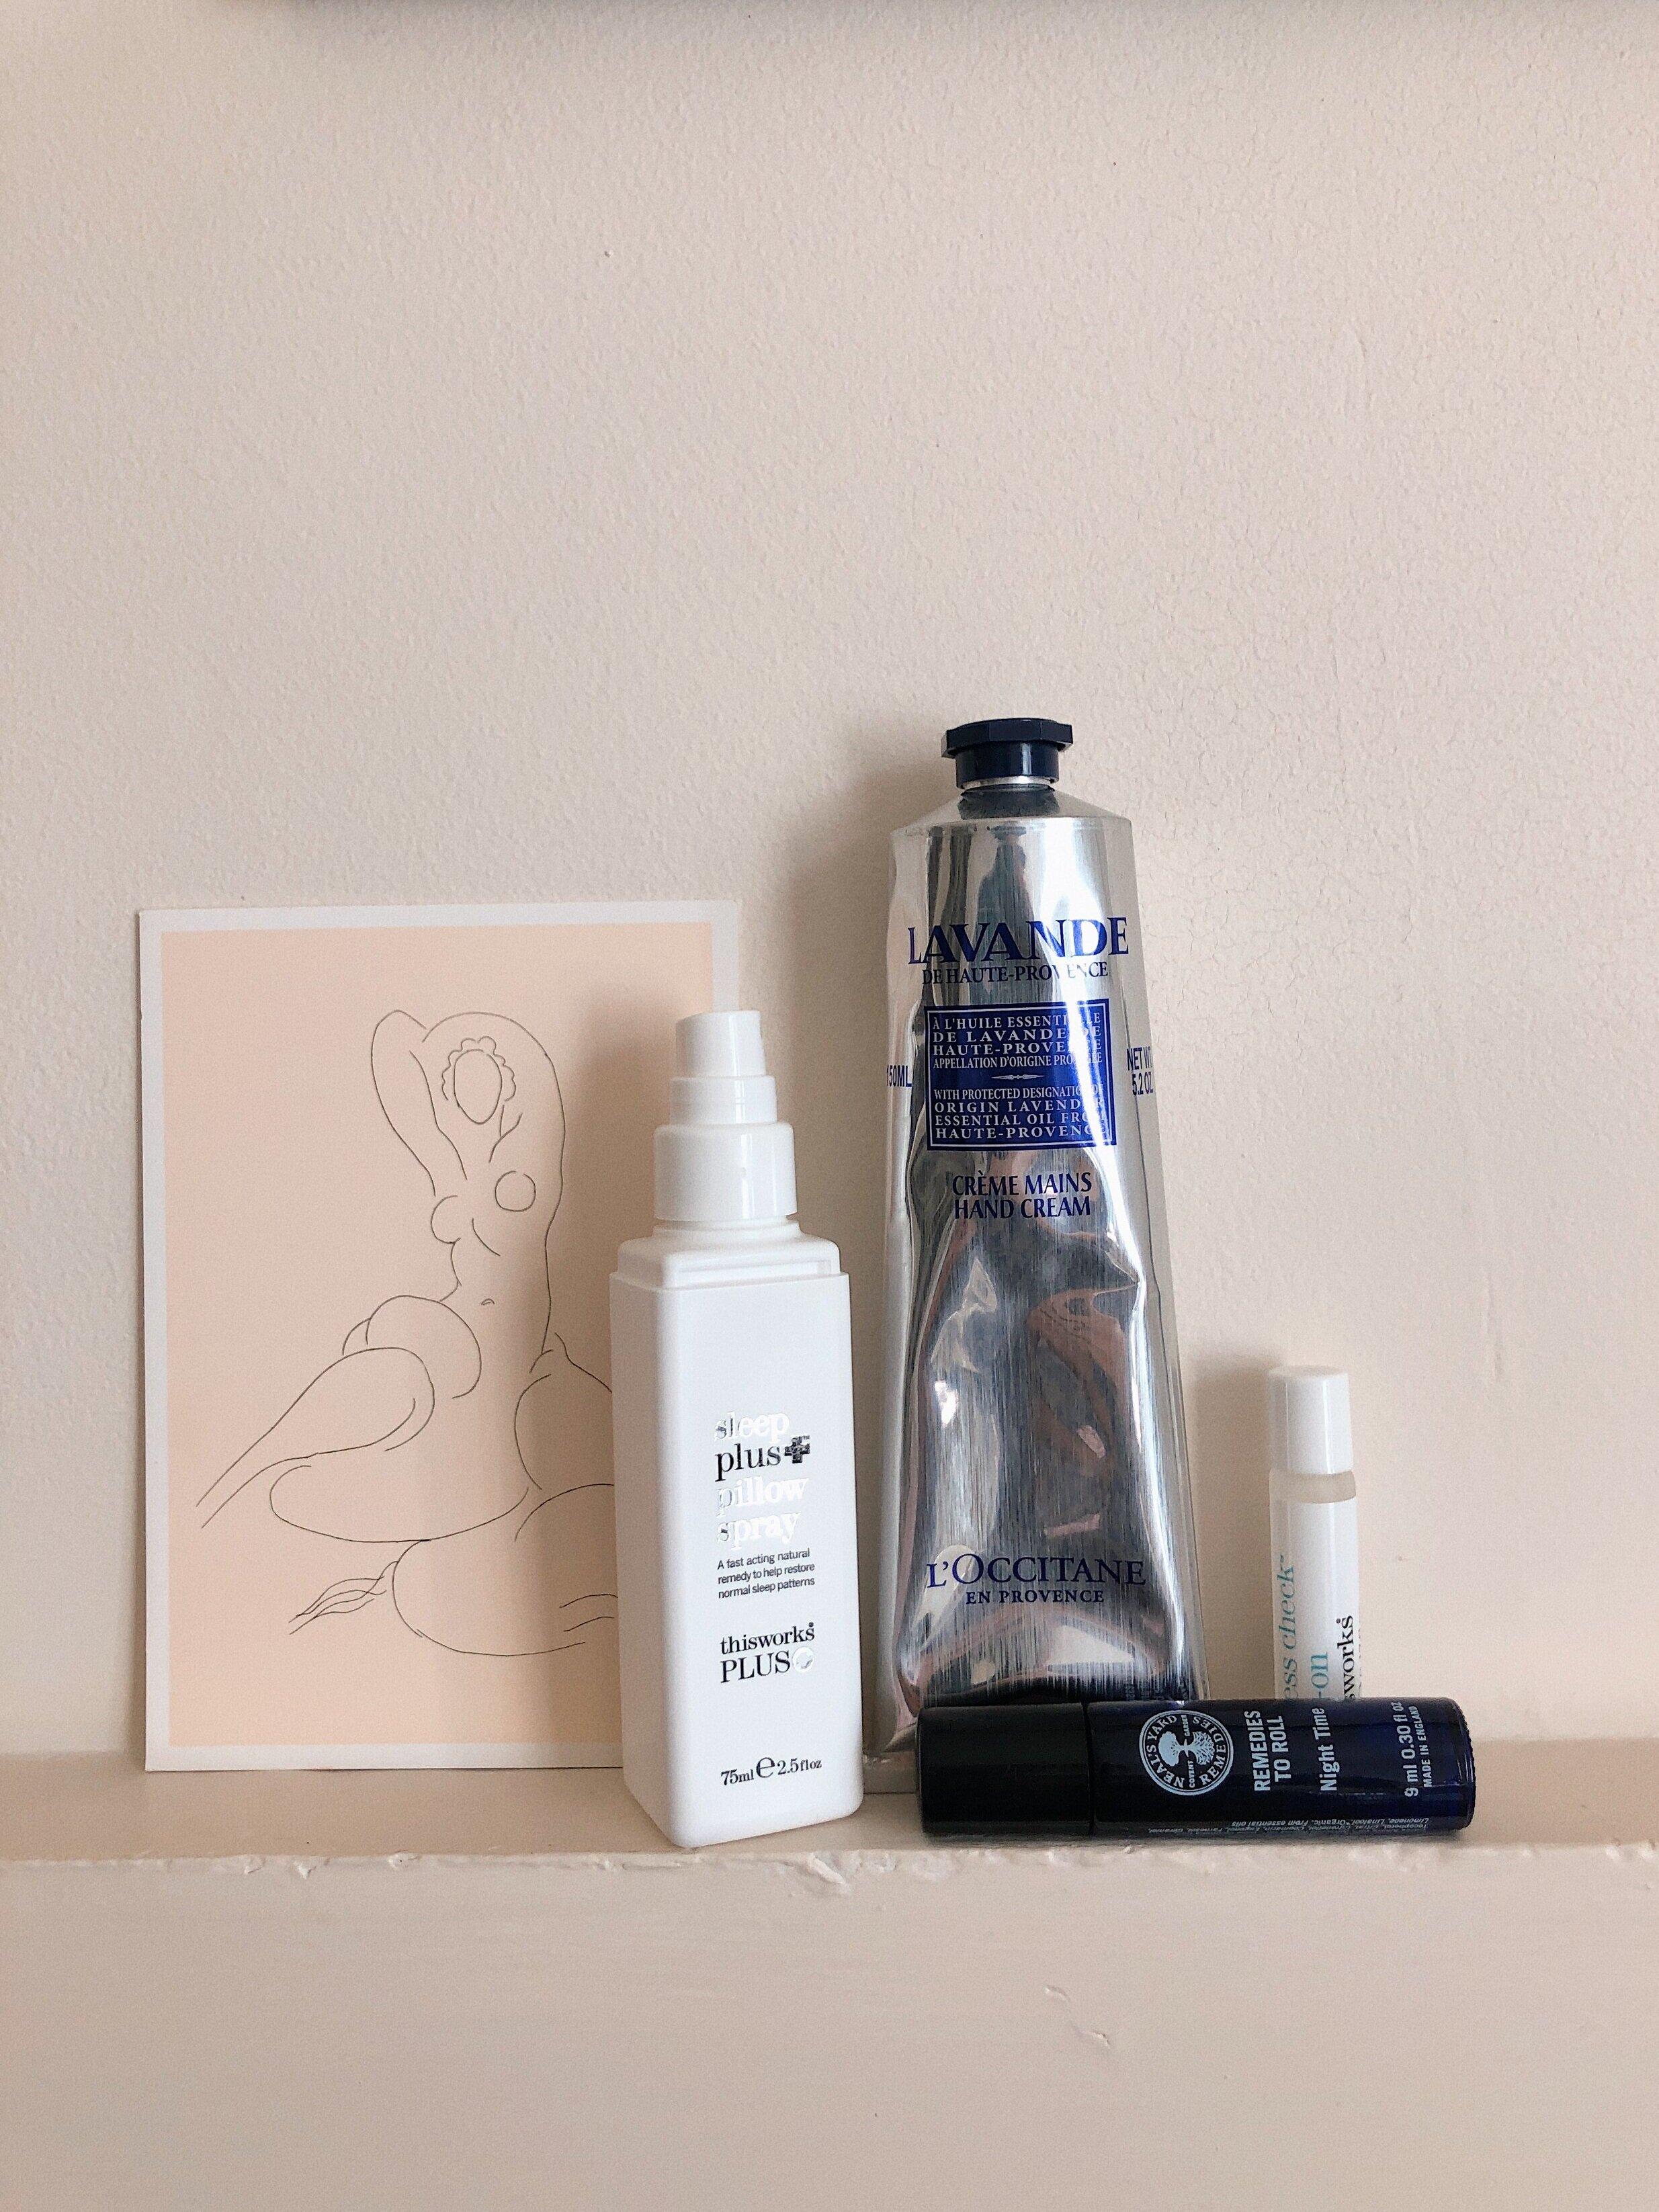 This+Works+Sleep+Plus+Pillow+Spray+Review